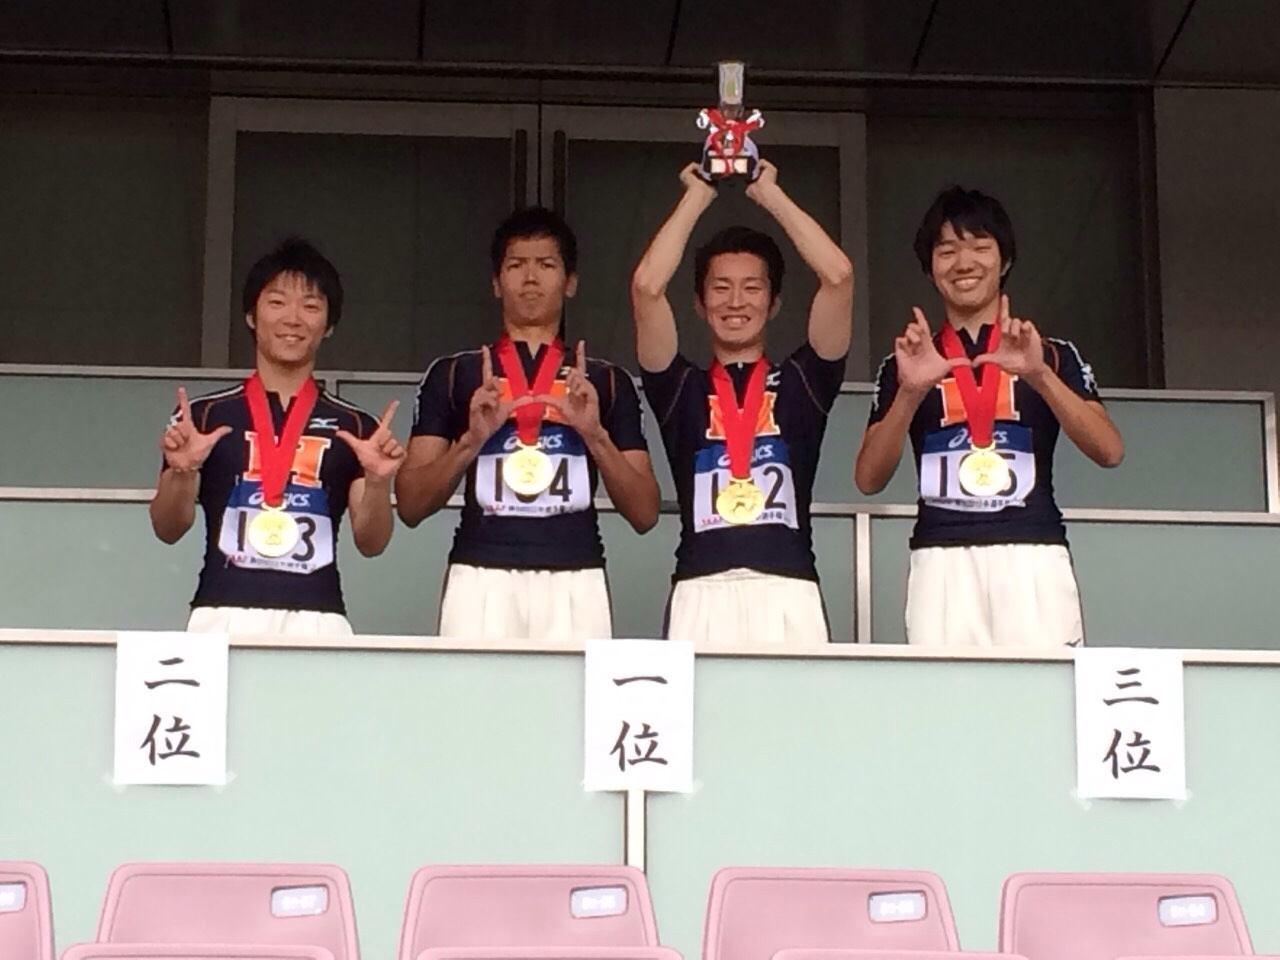 第98回日本陸上競技選手権リレー競技大会の結果 男子4×100m優勝